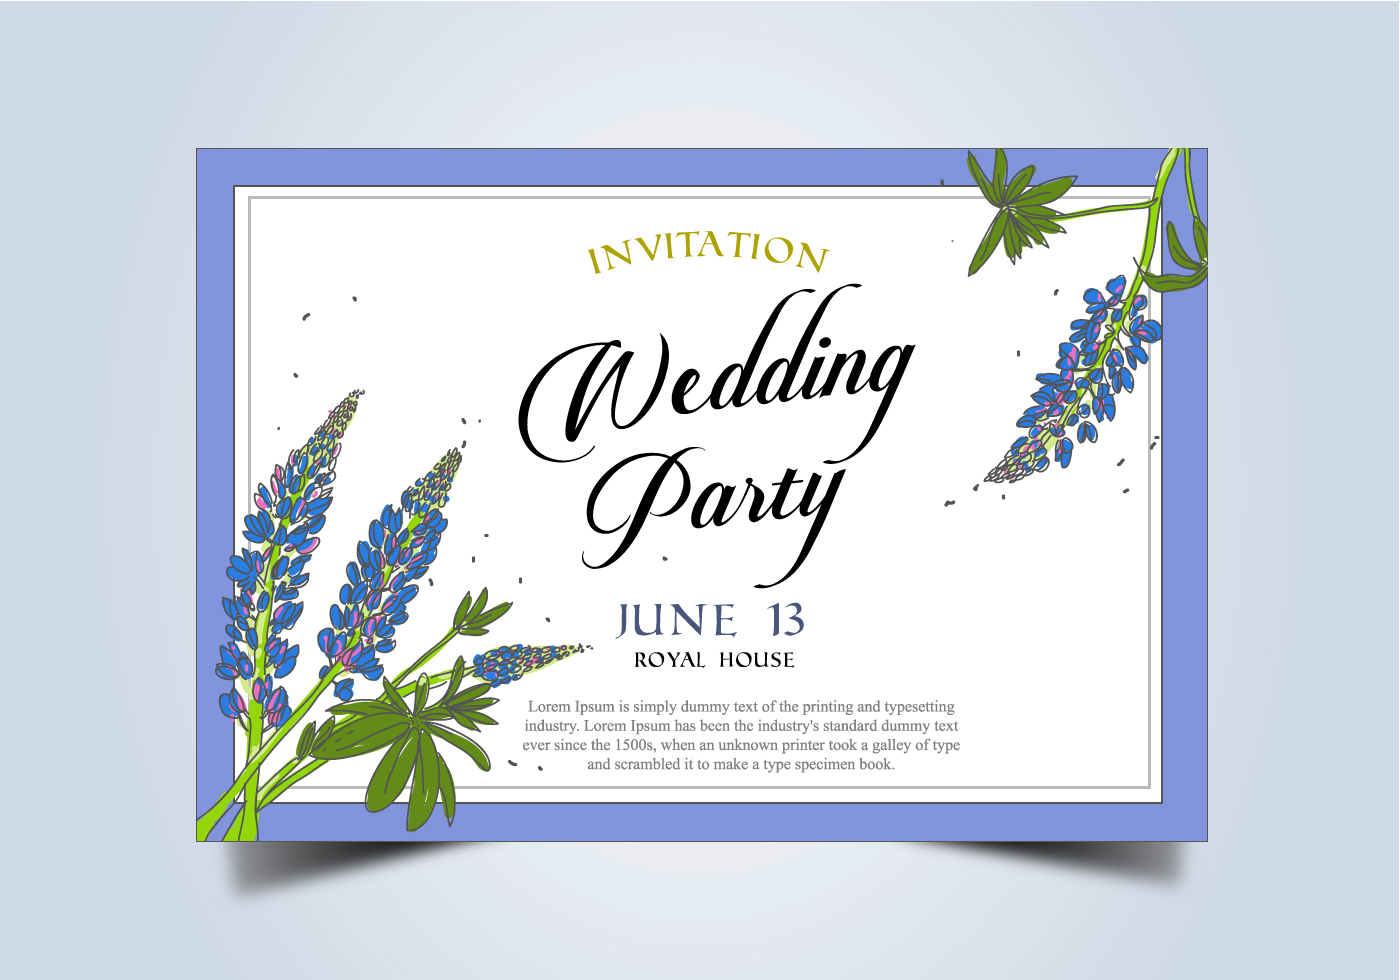 Wedding Invitation Frames: Blue Flowers Free Vector Art